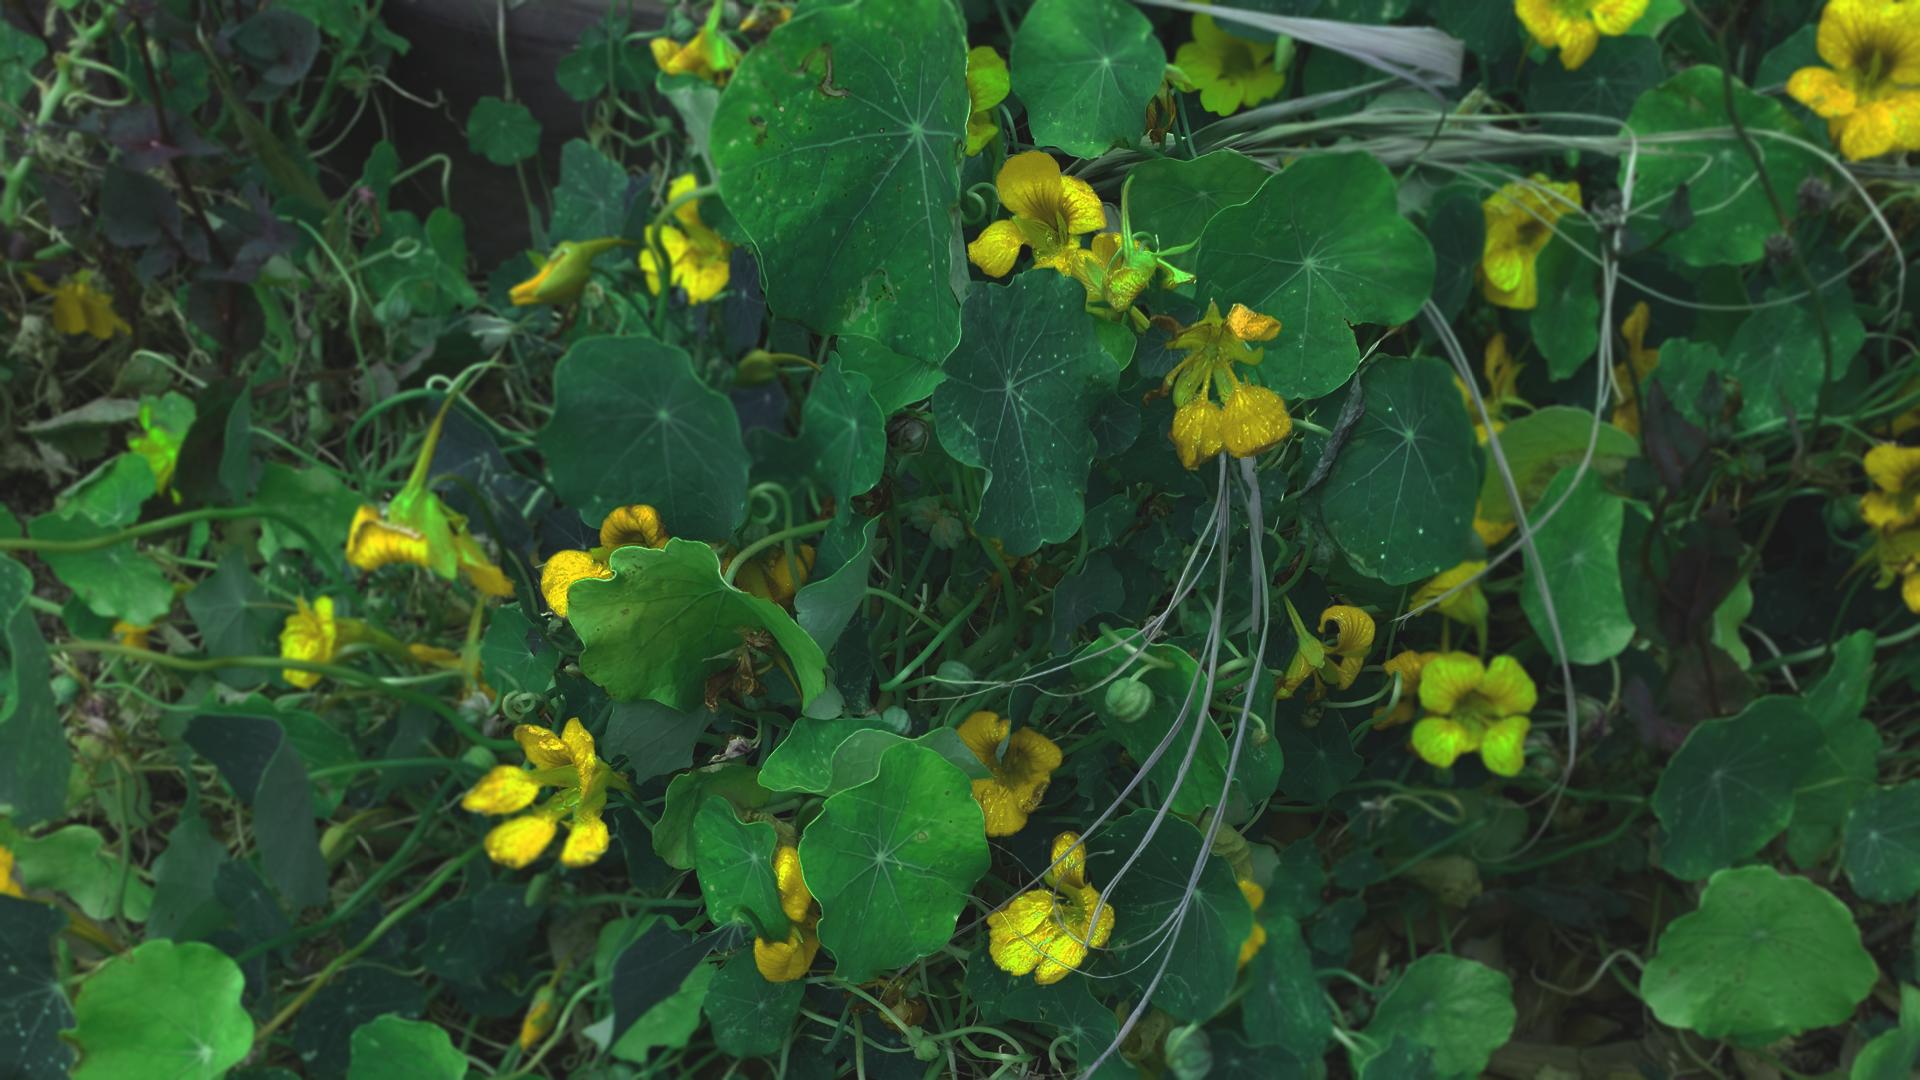 General 1920x1080 herbarium yellow roses overgrown